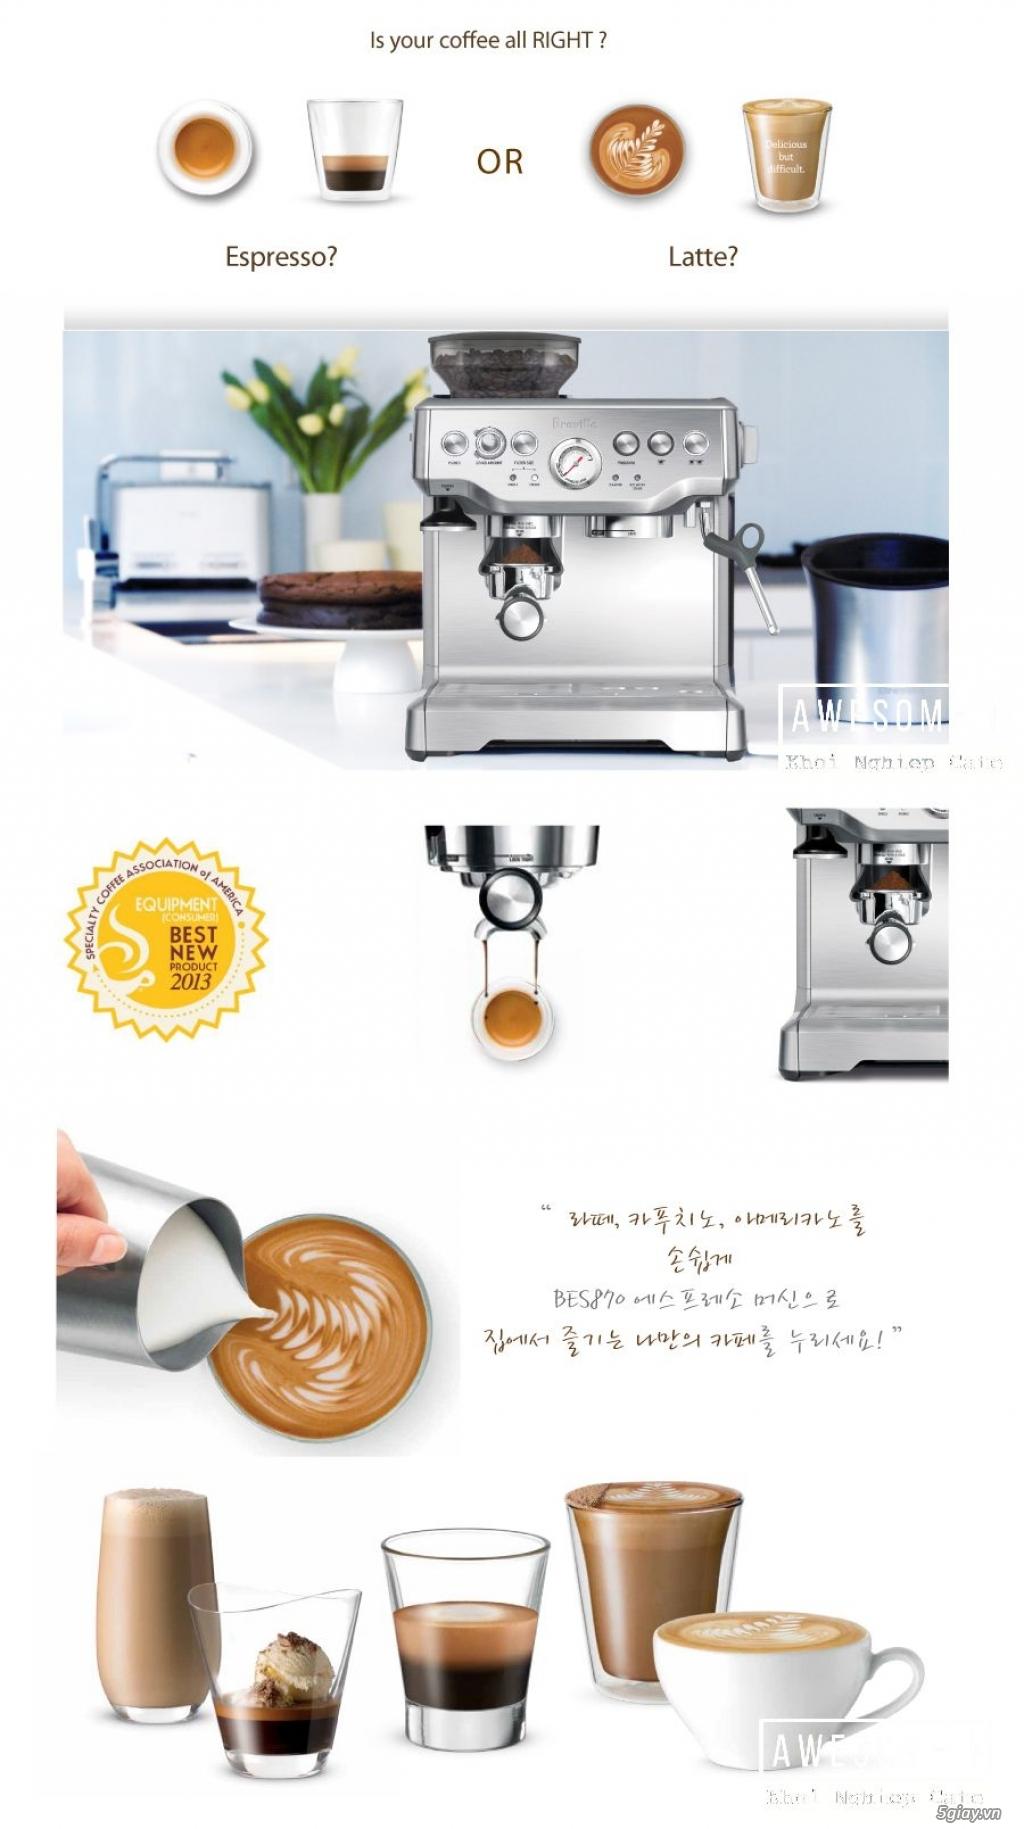 Máy pha cafe espresso Breville 870XL Australia [nhập khẩu chính hãng] - 1